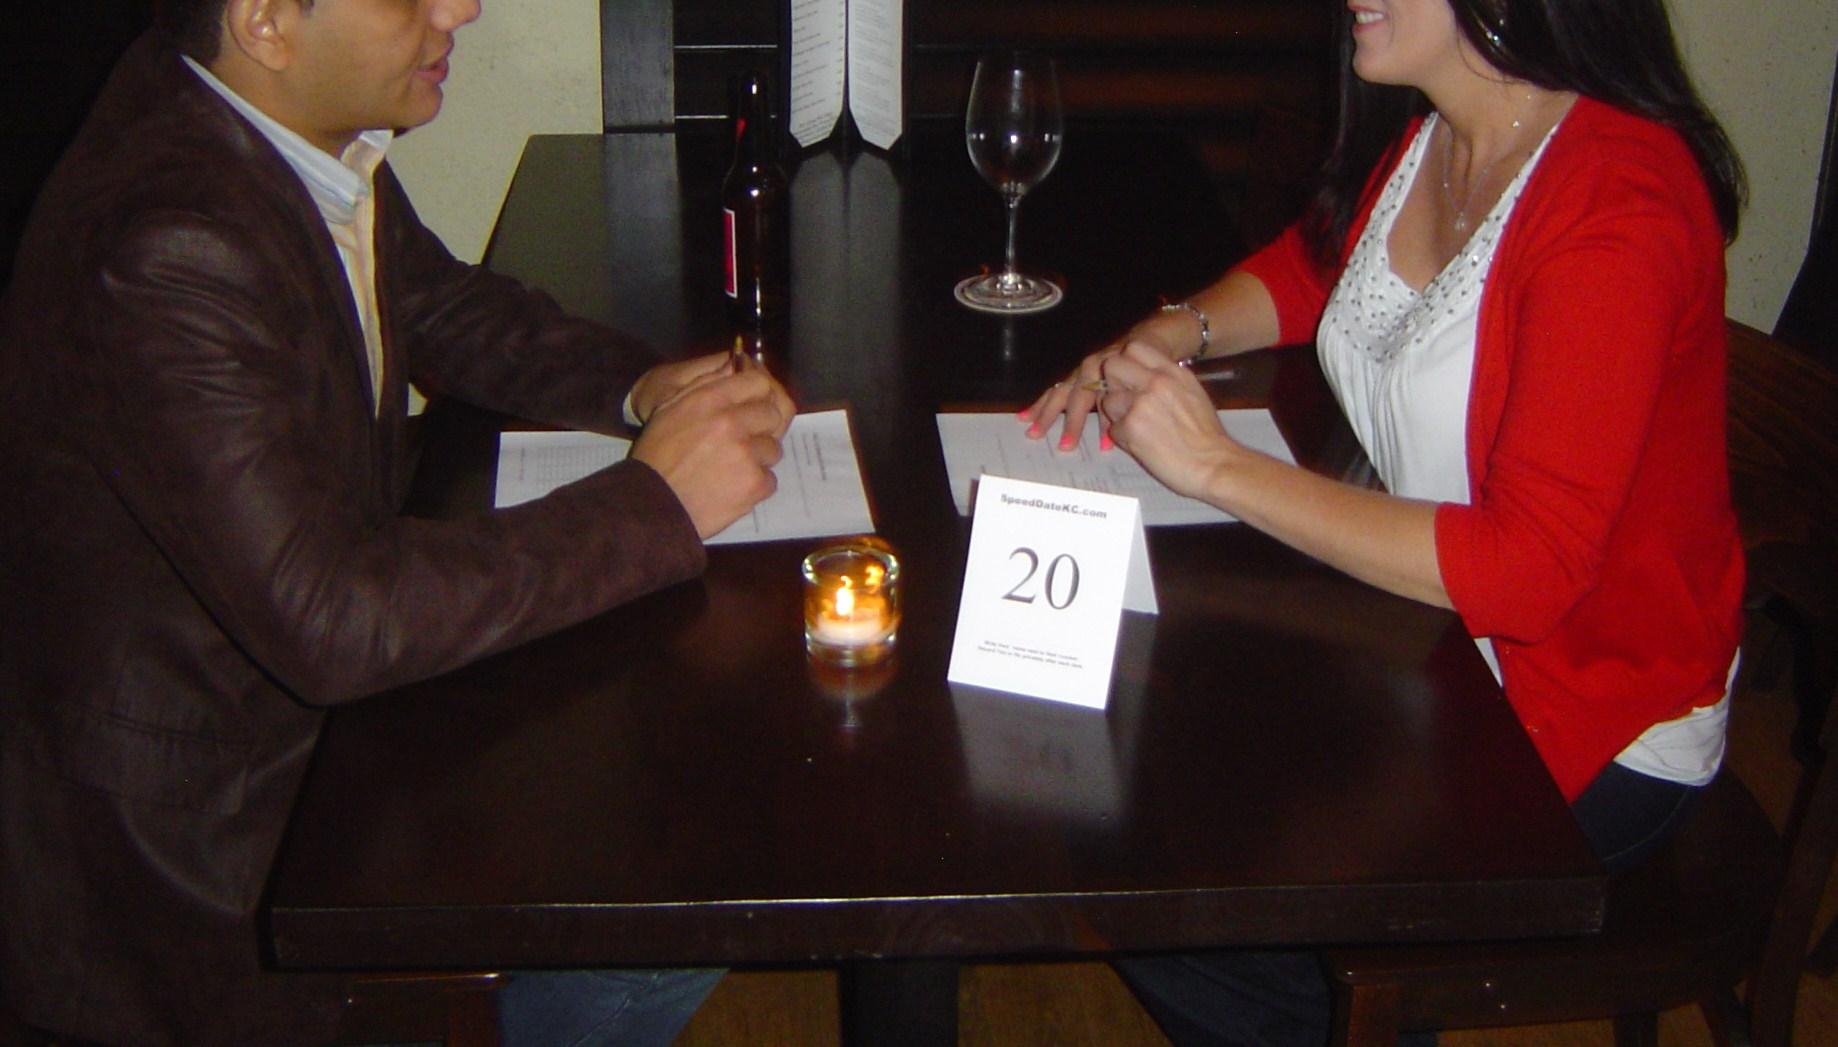 kansas city speed dating events